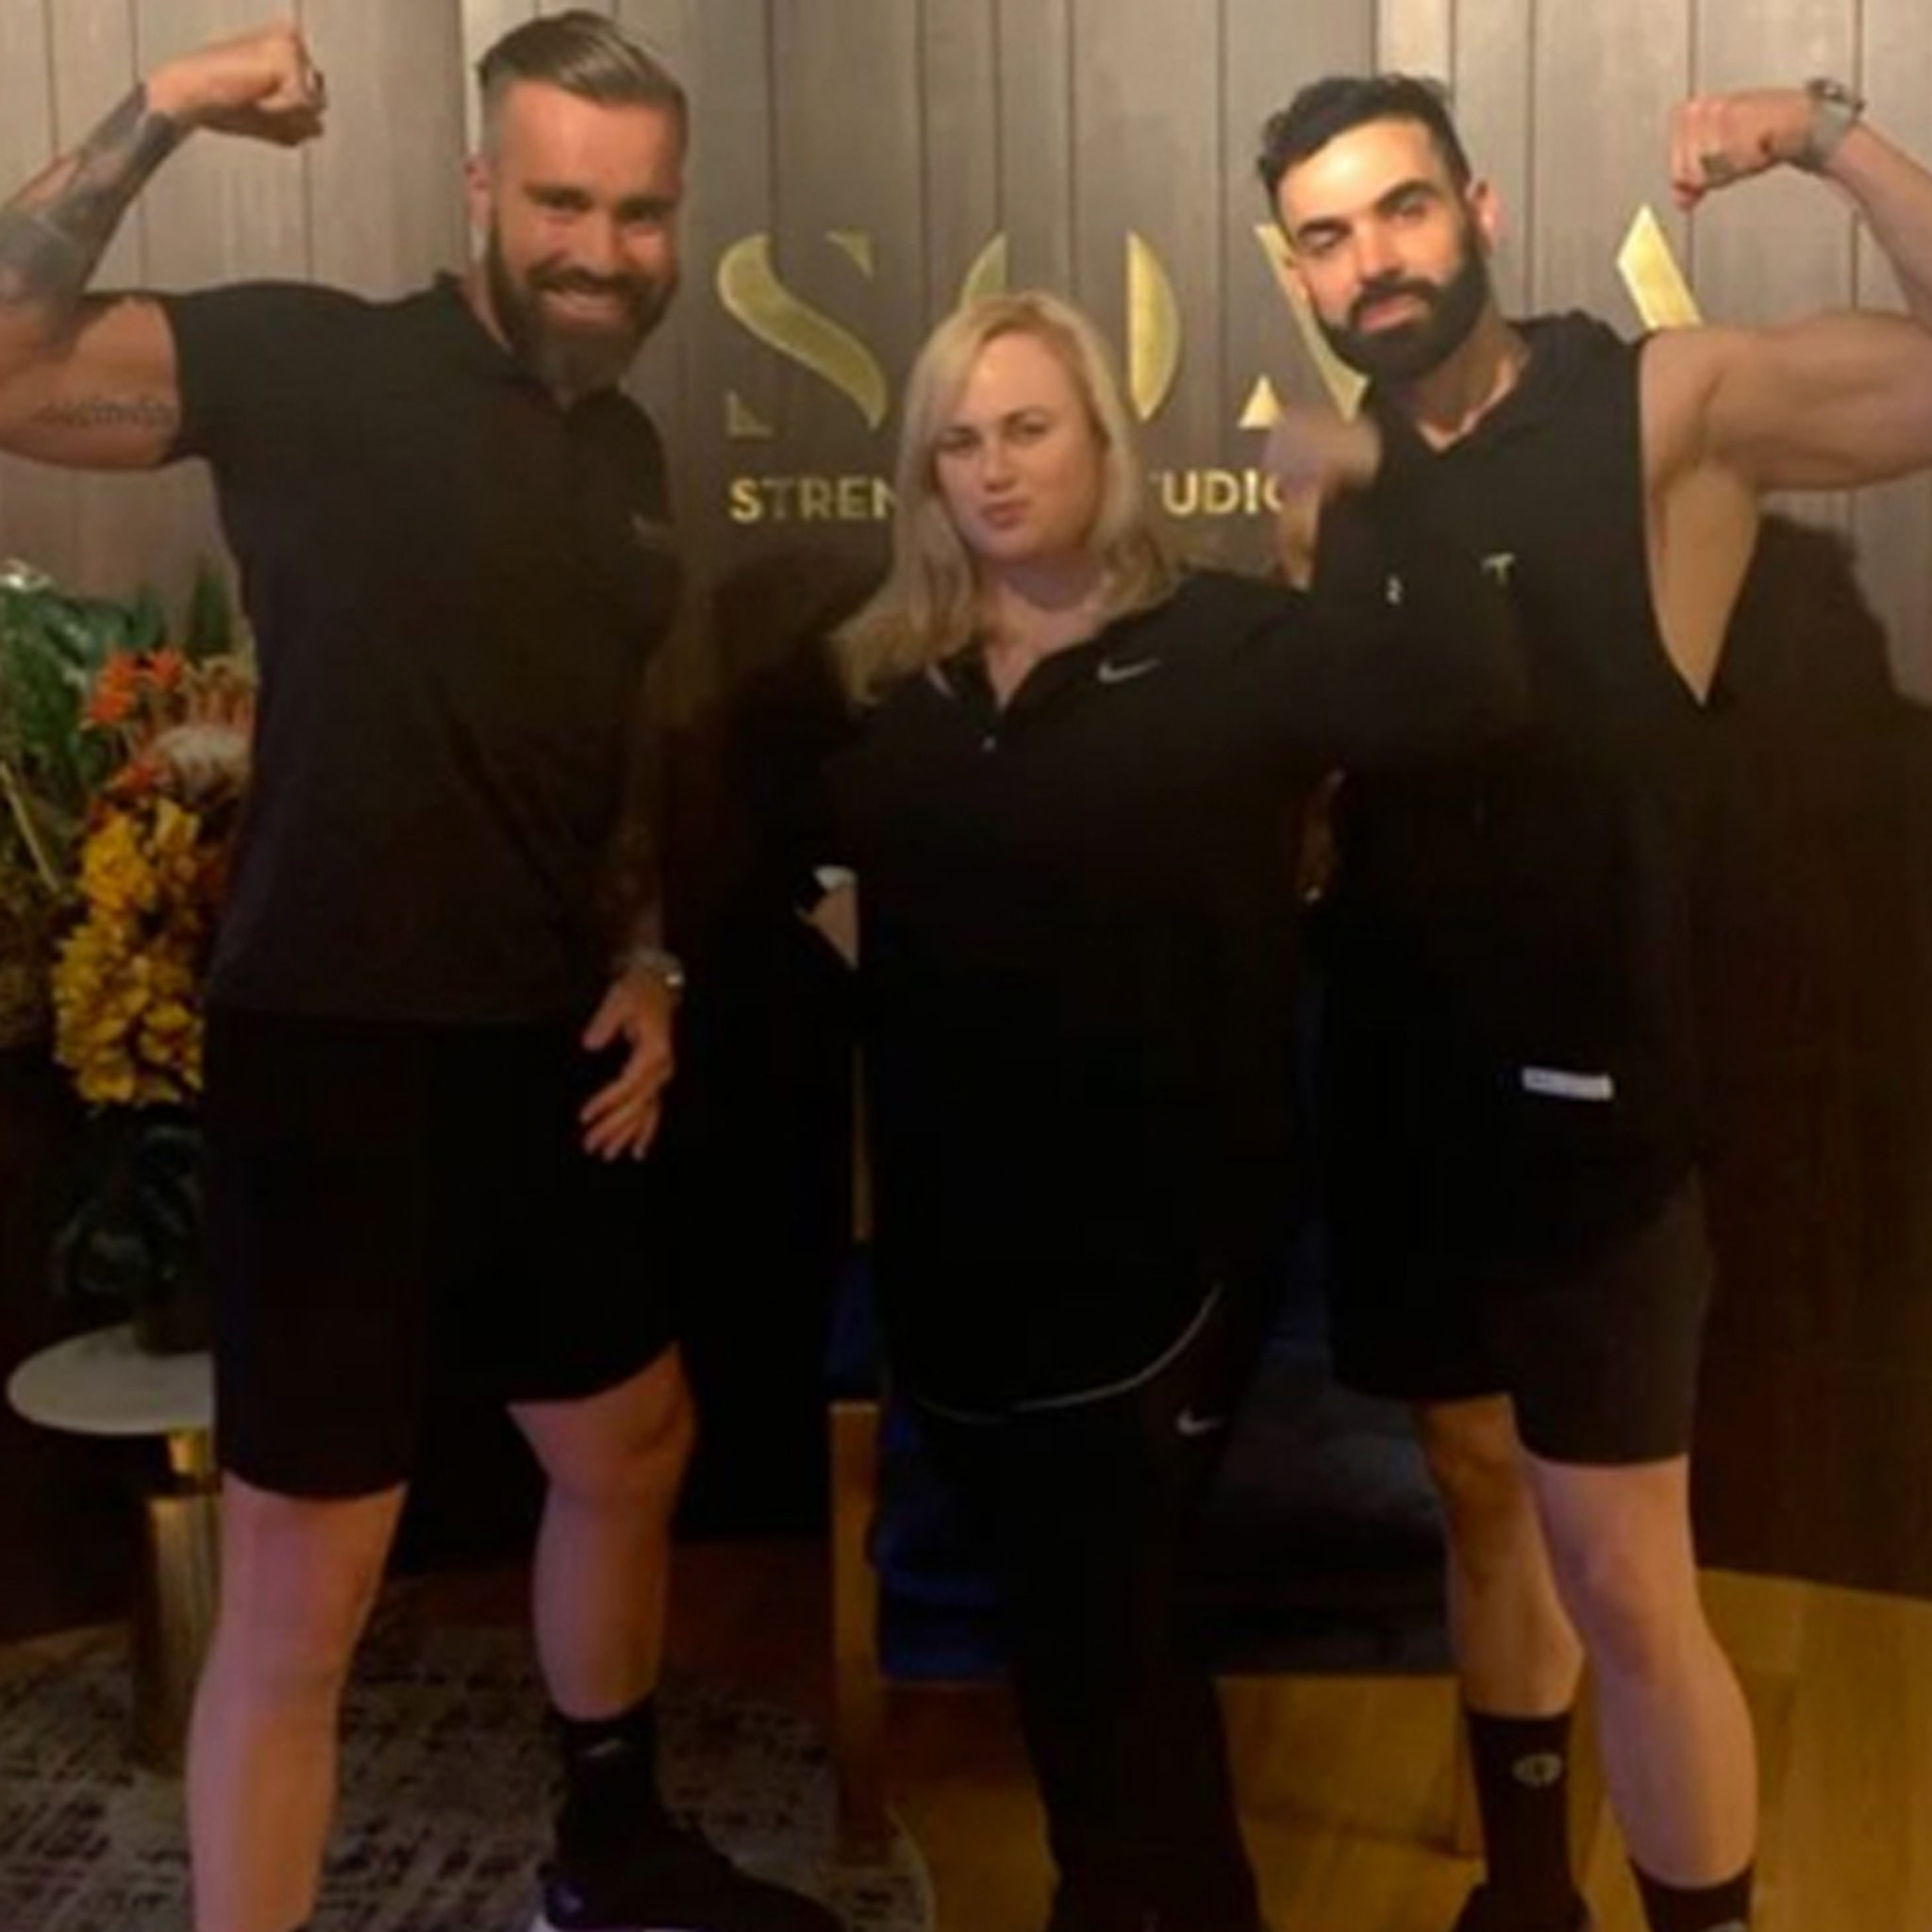 Rebel Wilson Reveals Slim New Look with Her Trainers